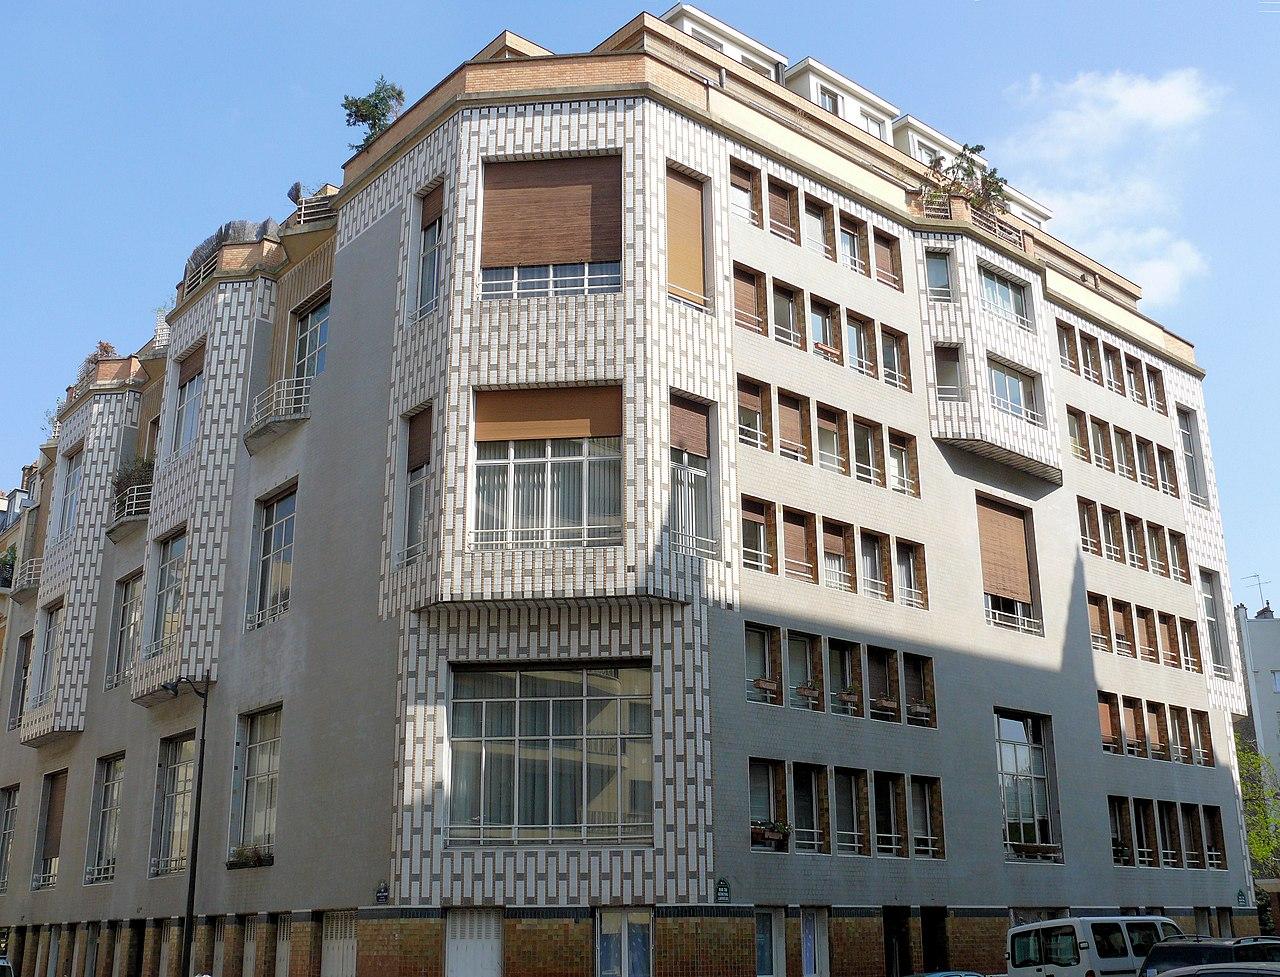 Rue De La Deco file:paris 16 - studio building - 65 rue jean de la fontaine